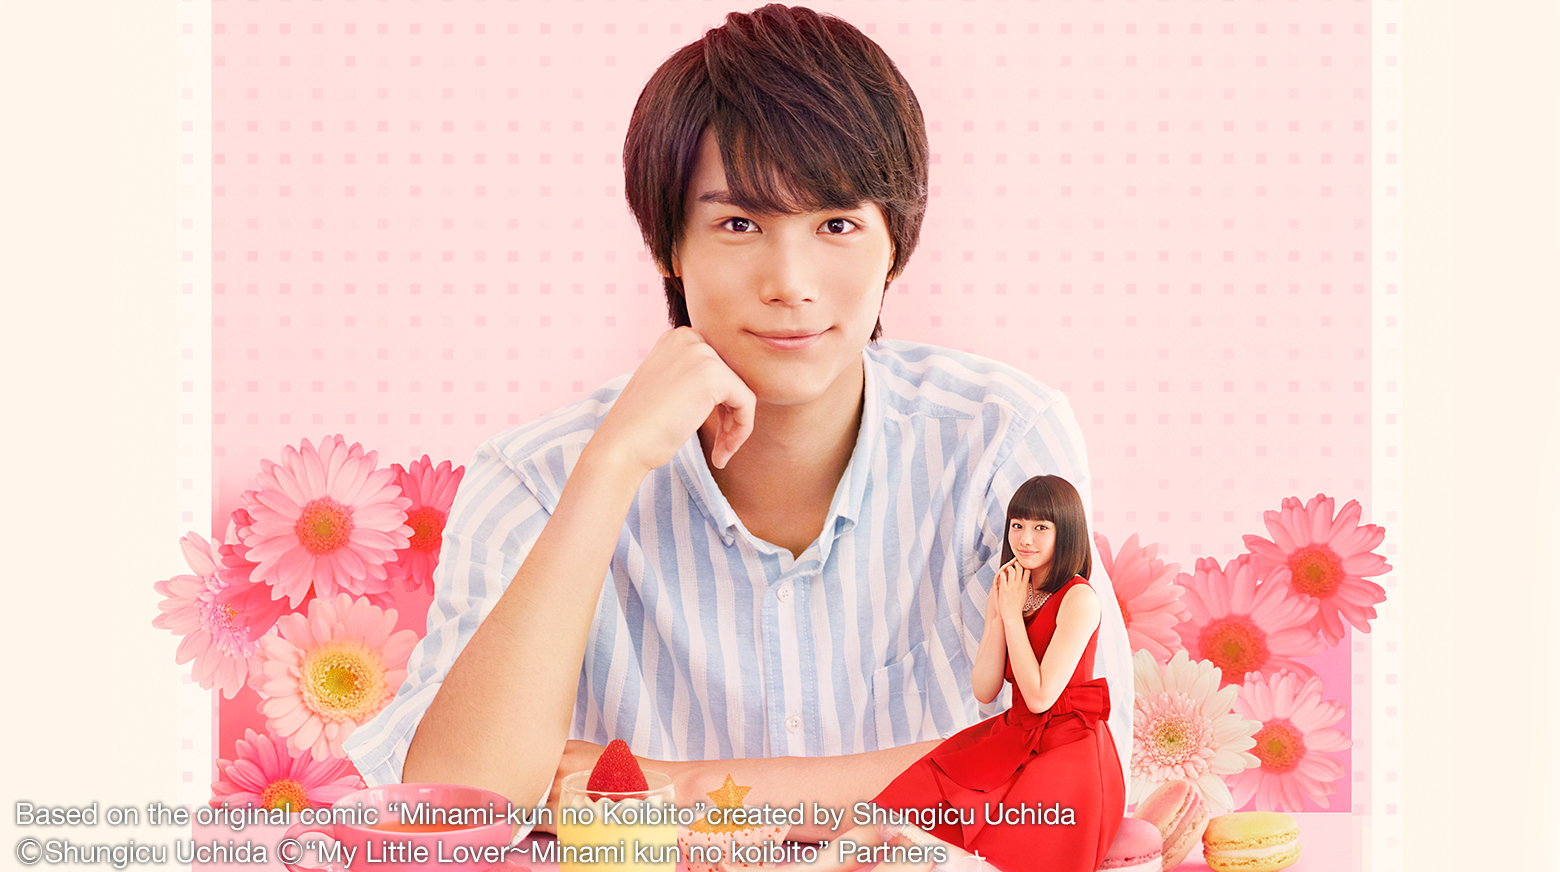 My Little Lover - Minami Kun No Koibito Episode 5